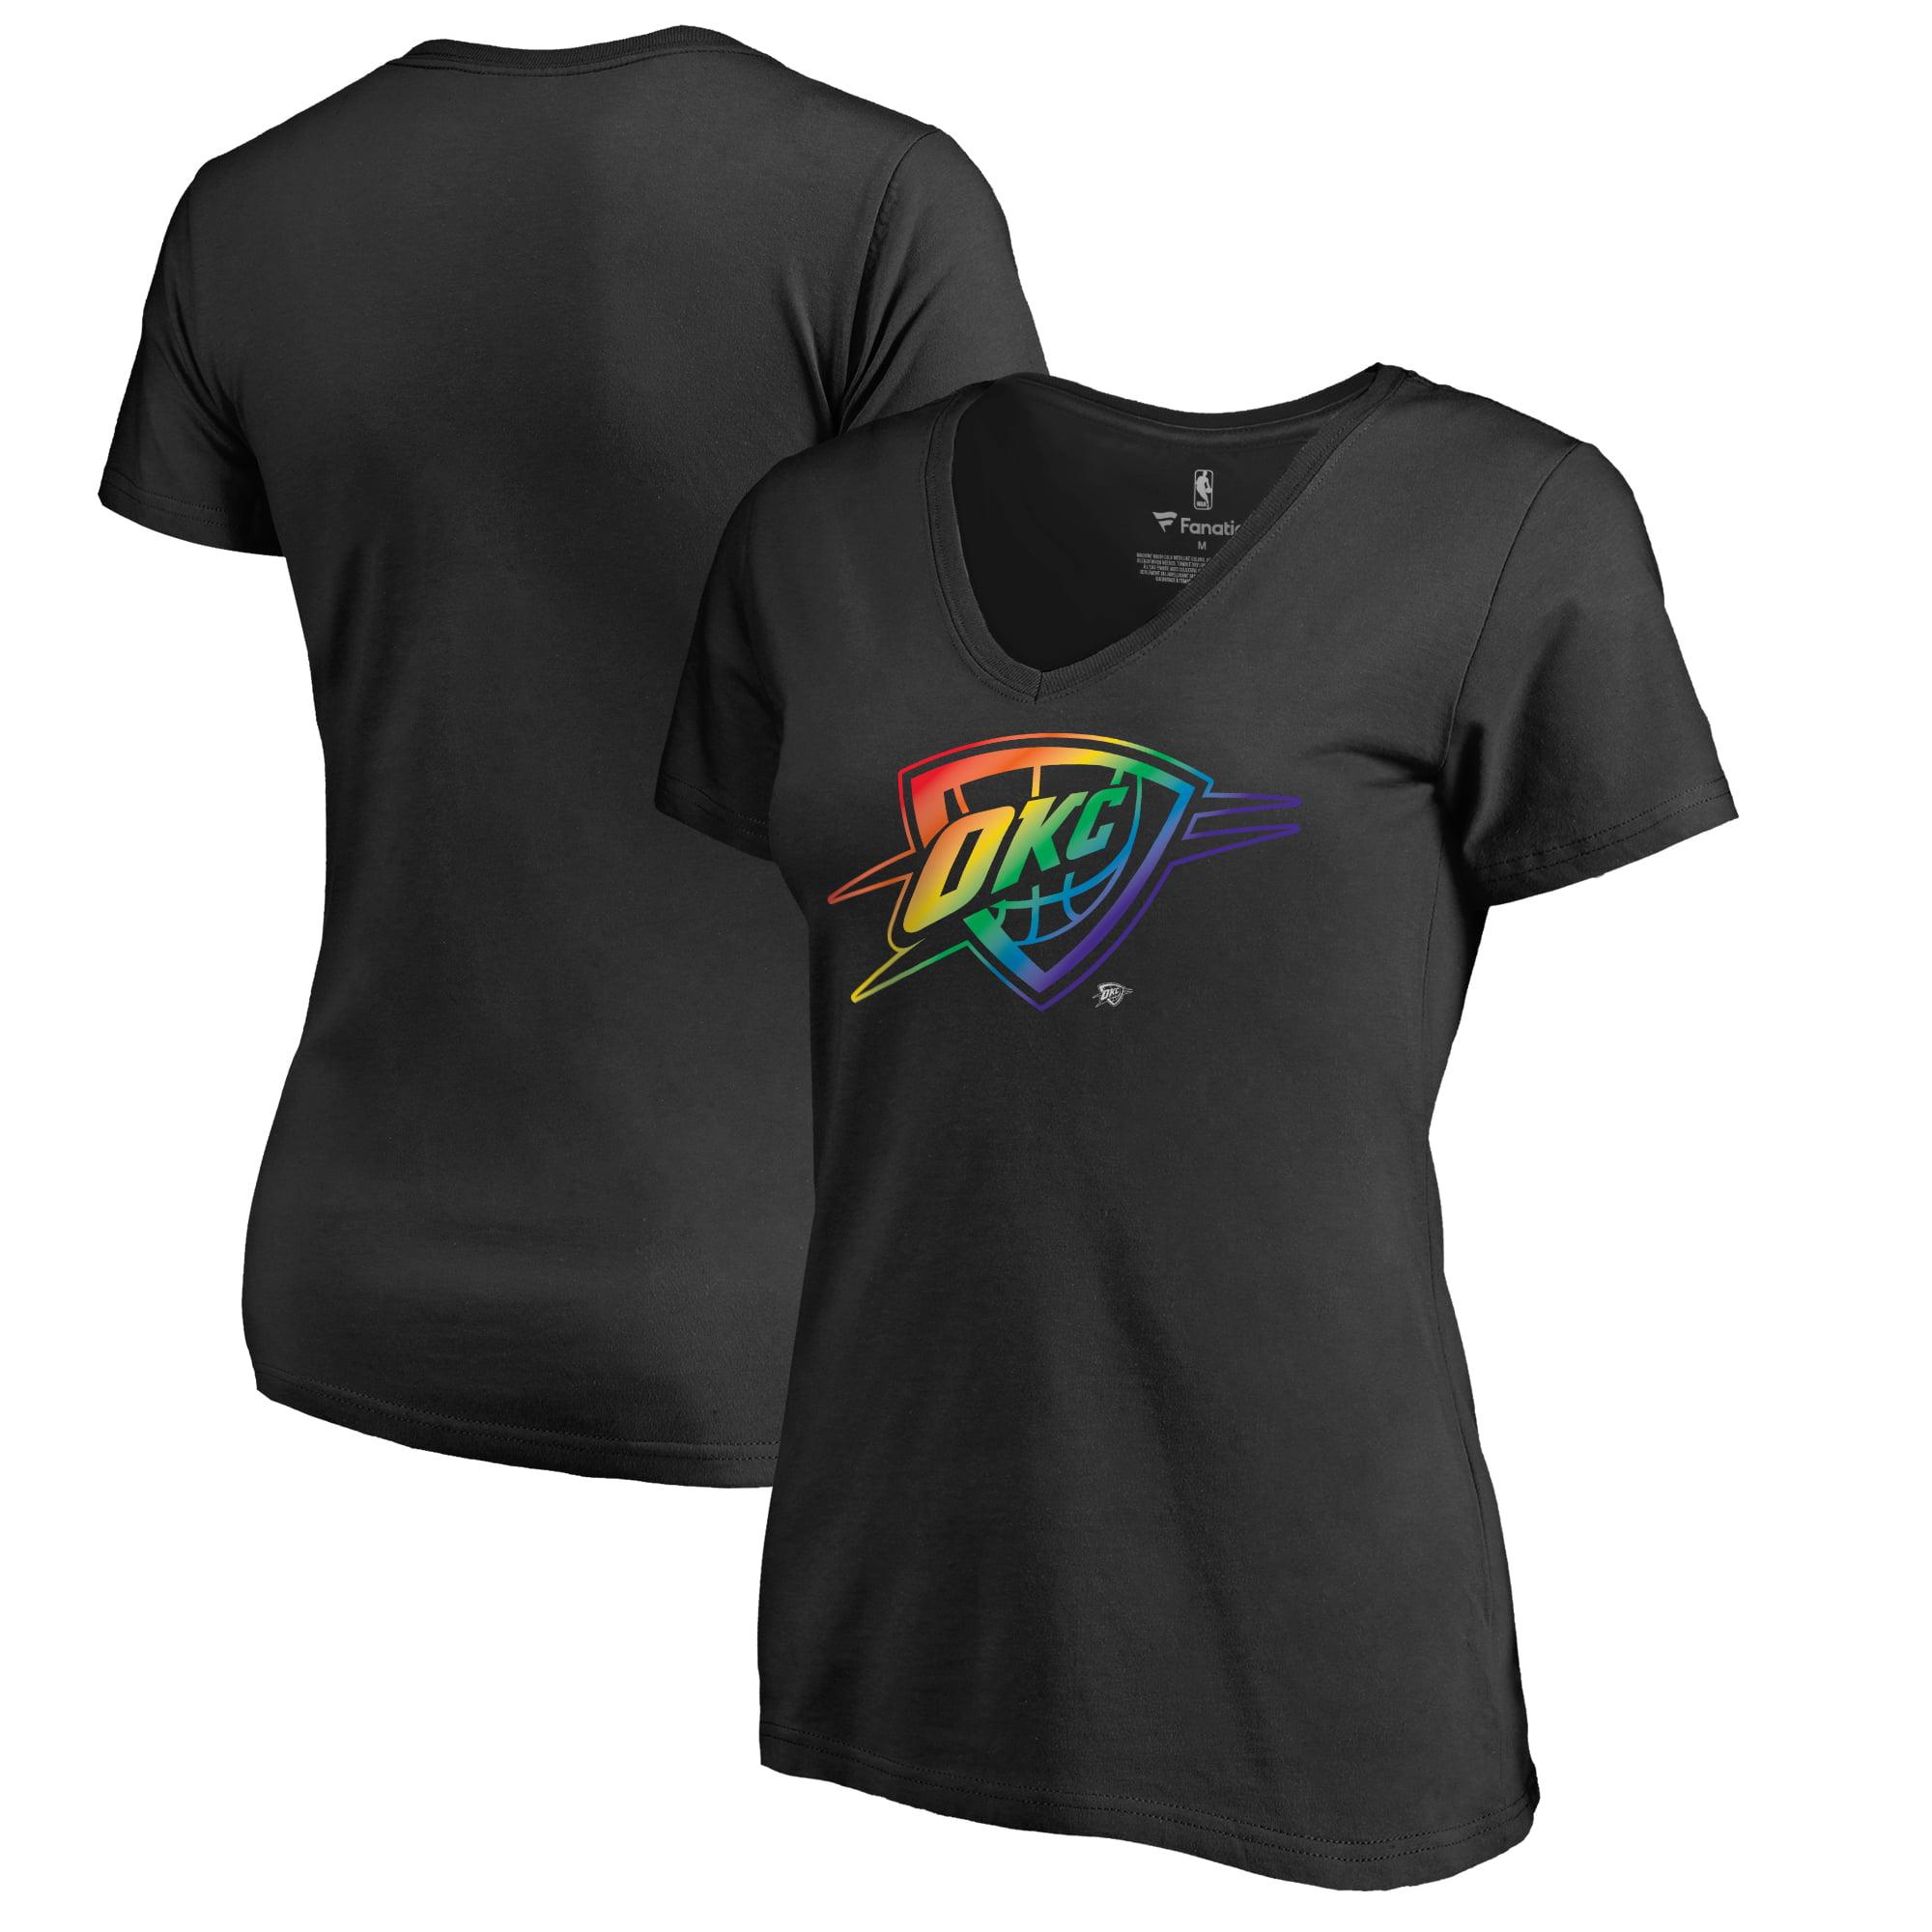 Oklahoma City Thunder Fanatics Branded Women's Team Pride V-Neck T-Shirt - Black